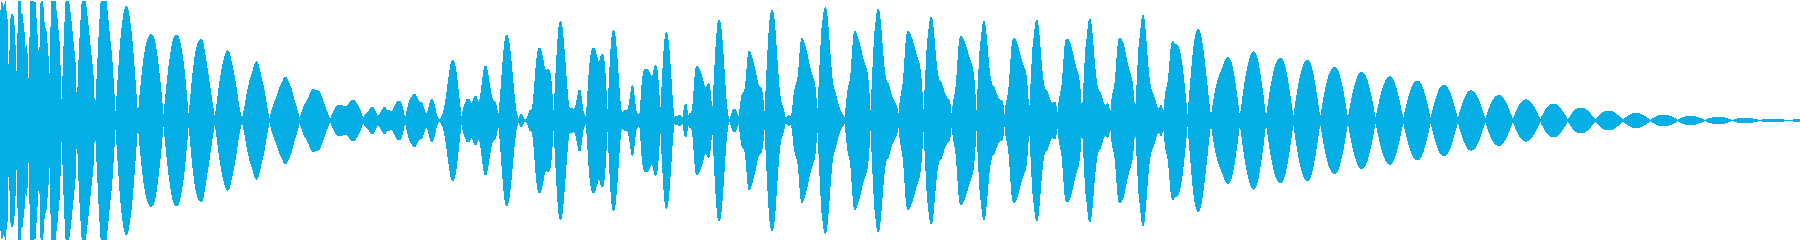 EDMキック キーG の再生済みの波形